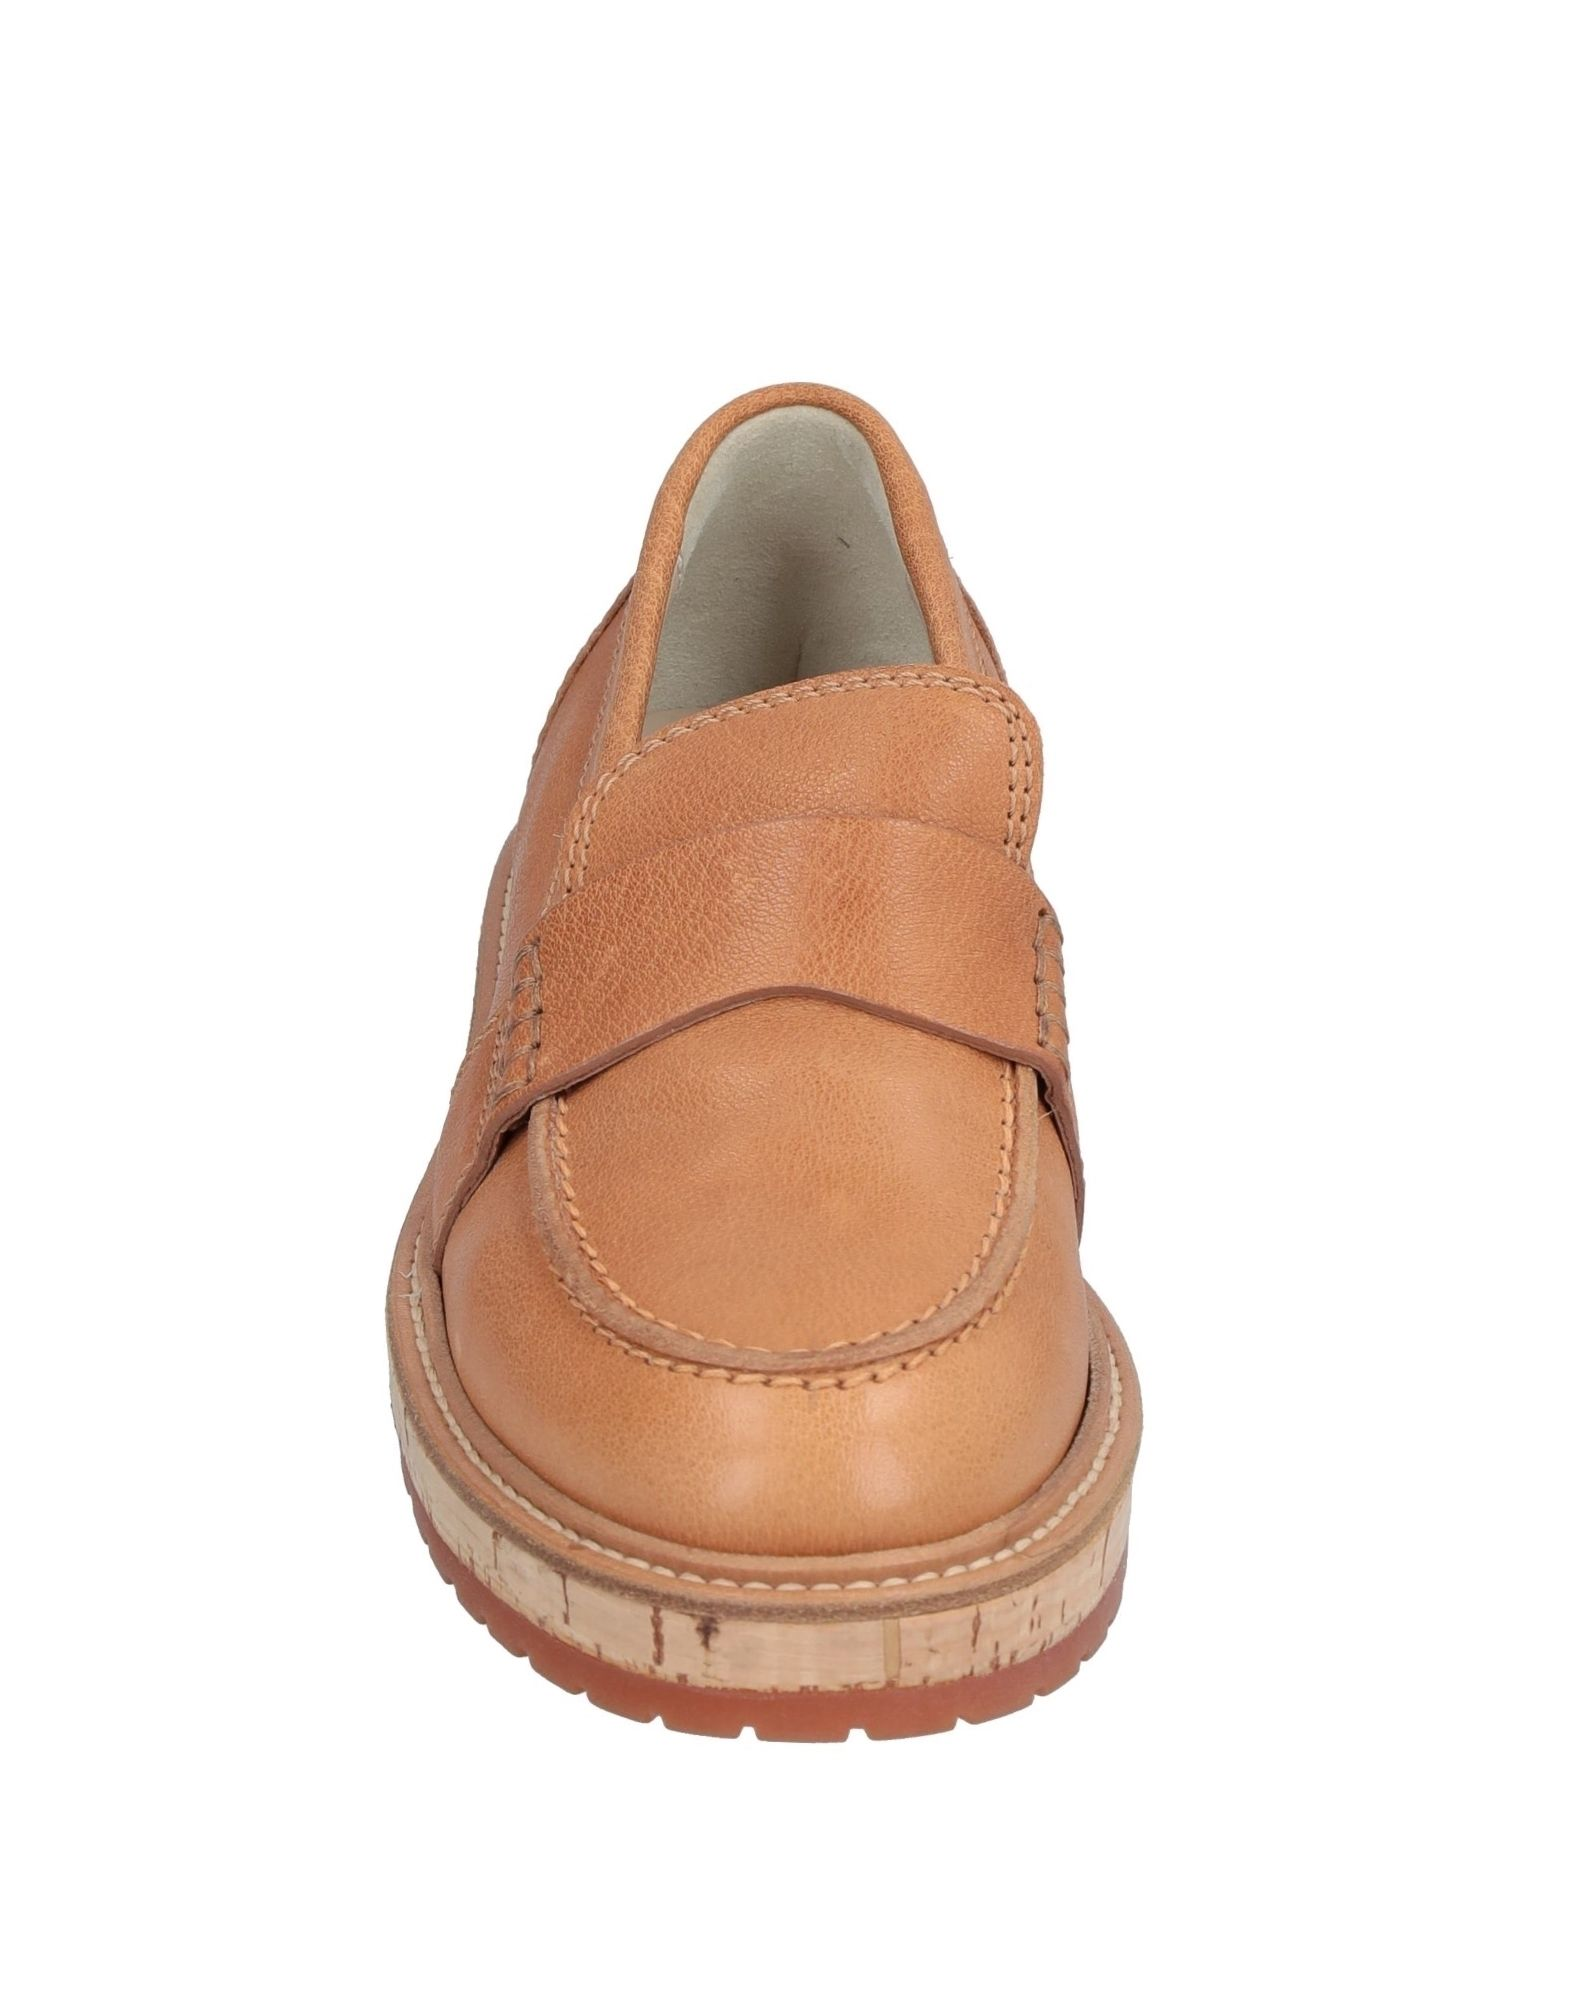 Agl Attilio 11099557VFGut Giusti Leombruni Mokassins Damen  11099557VFGut Attilio aussehende strapazierfähige Schuhe 67e2ce